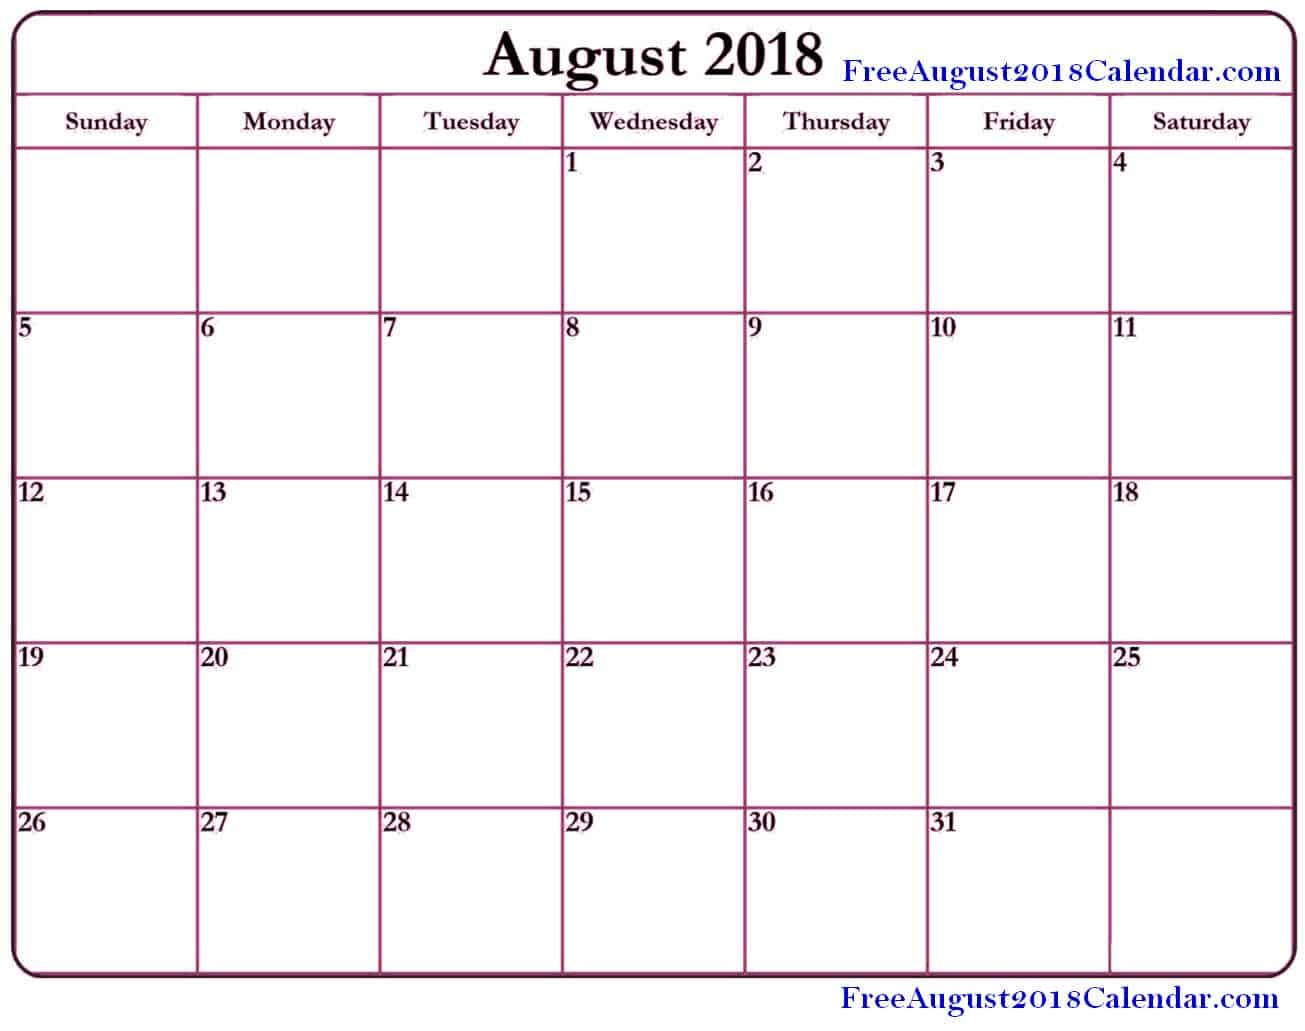 Calendar for August 2018 Template